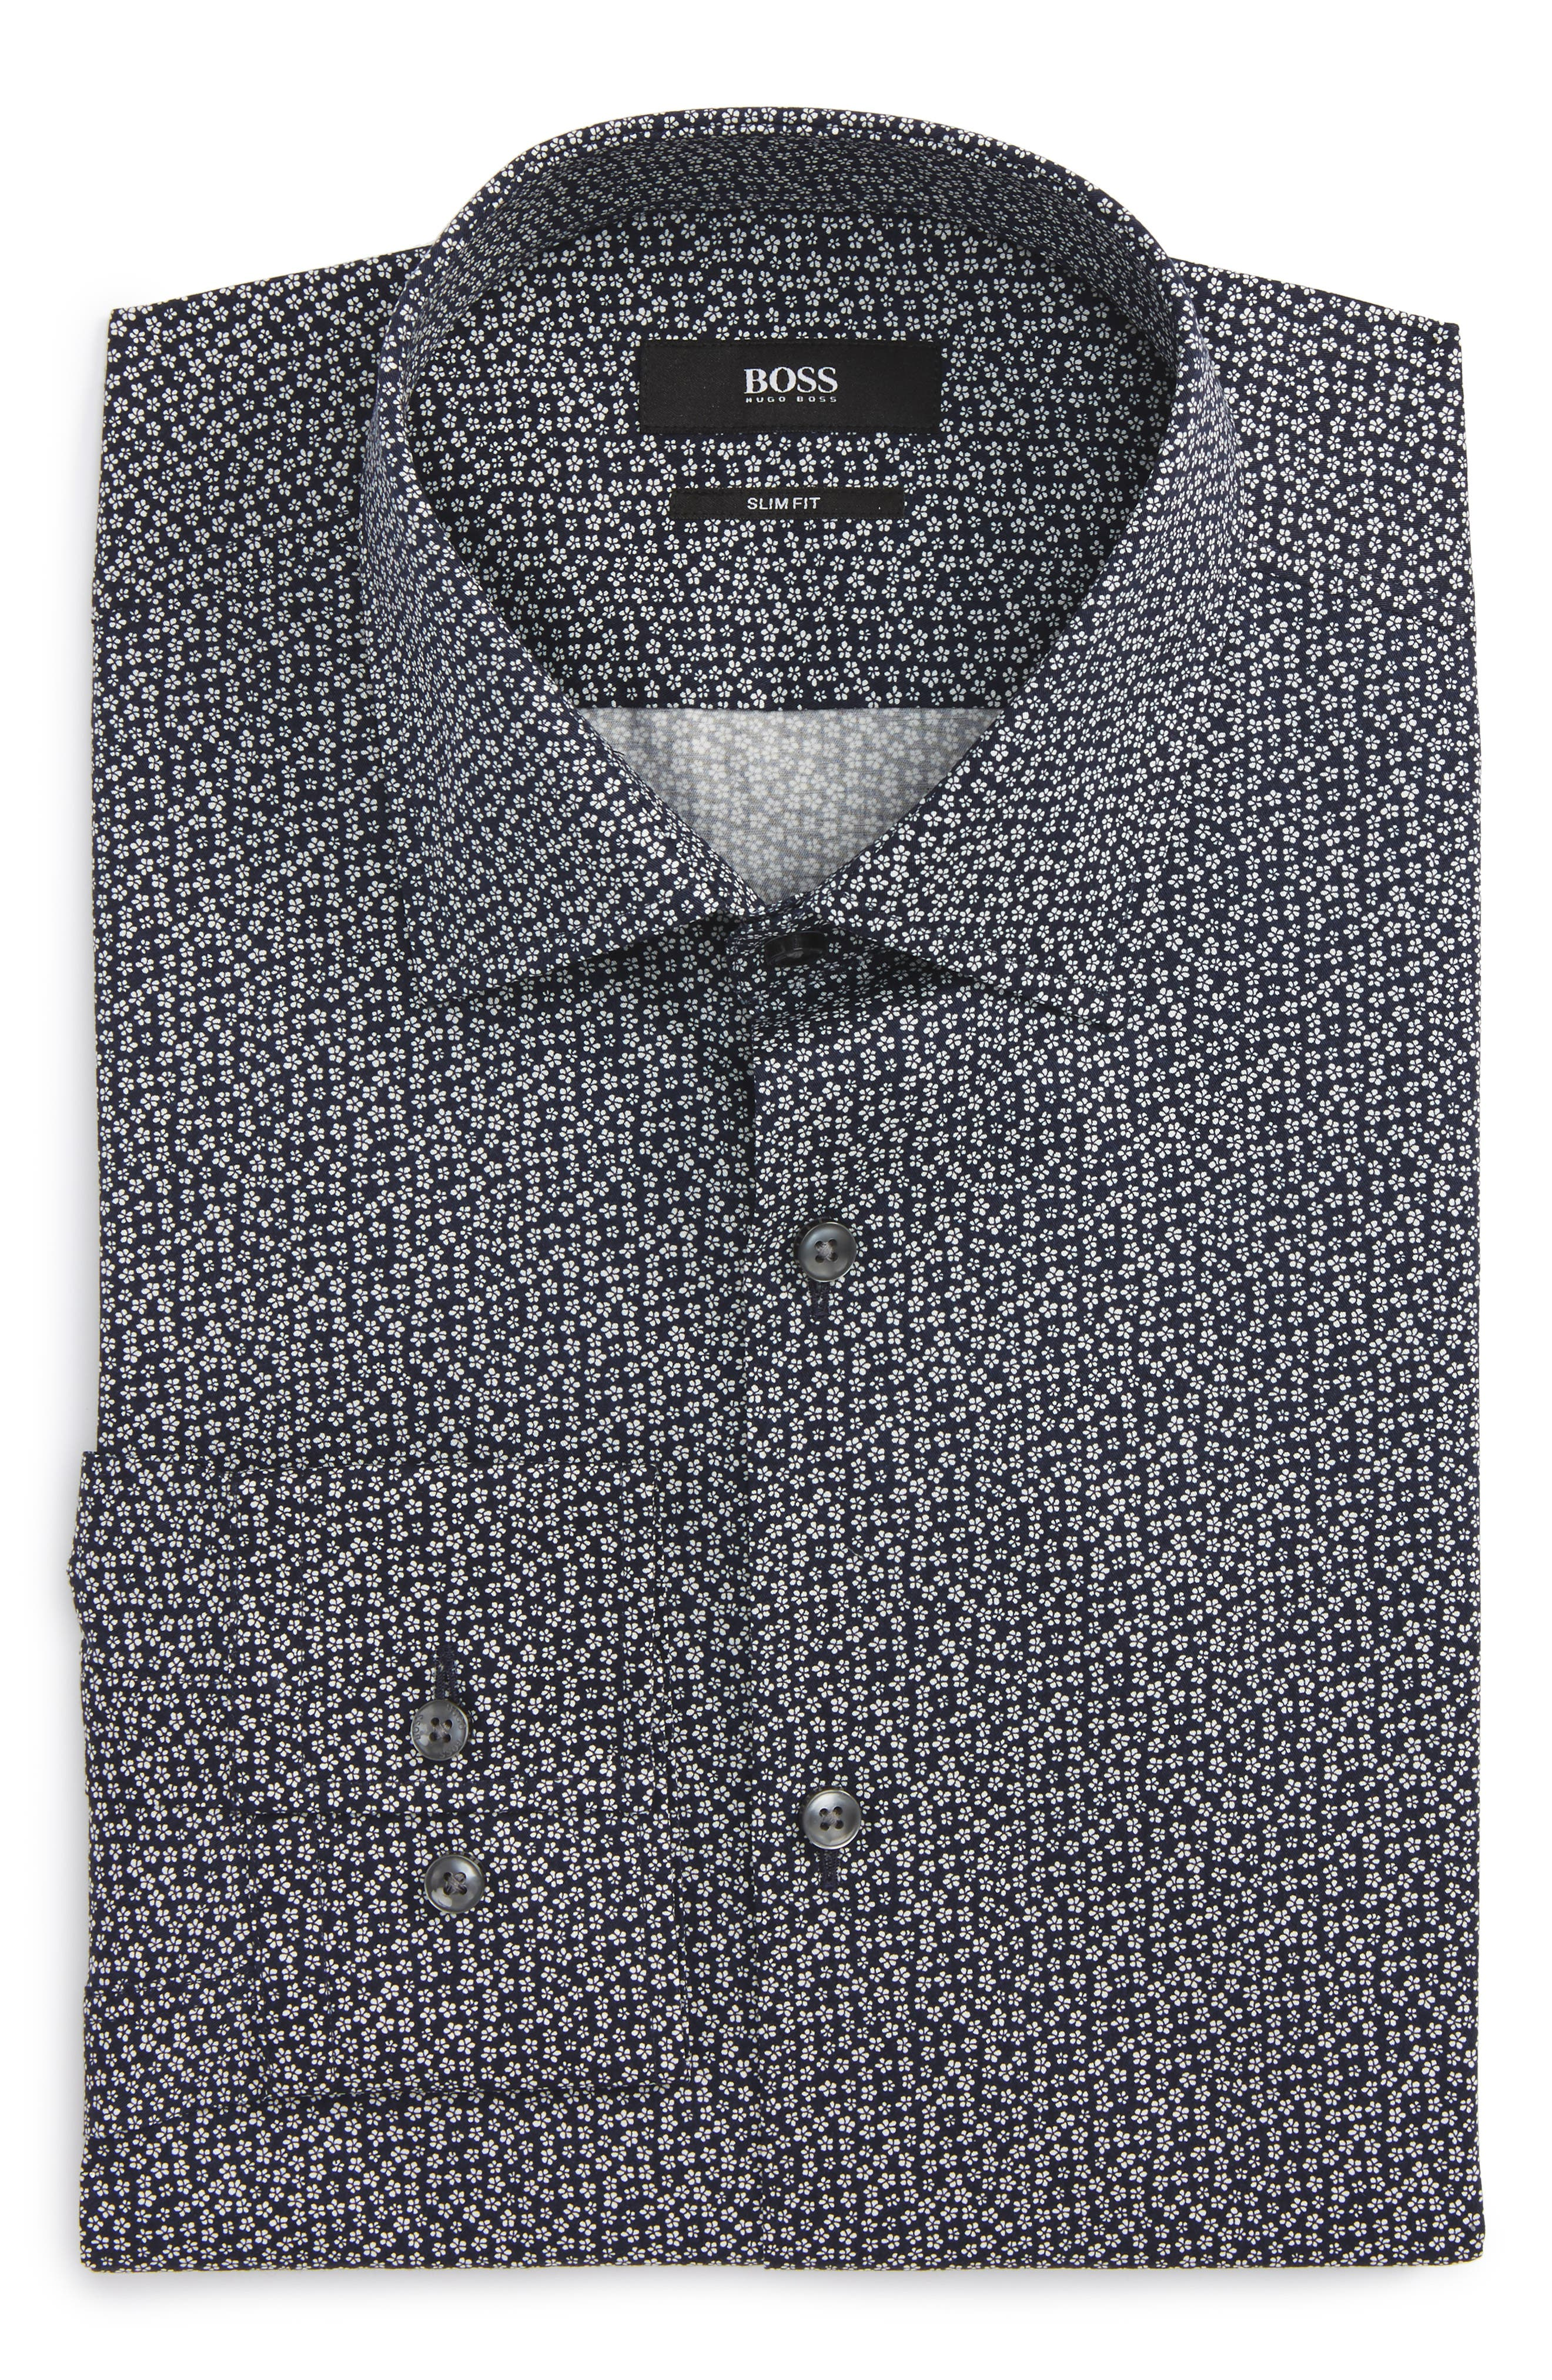 Slim Fit Floral Dress Shirt,                         Main,                         color, Navy